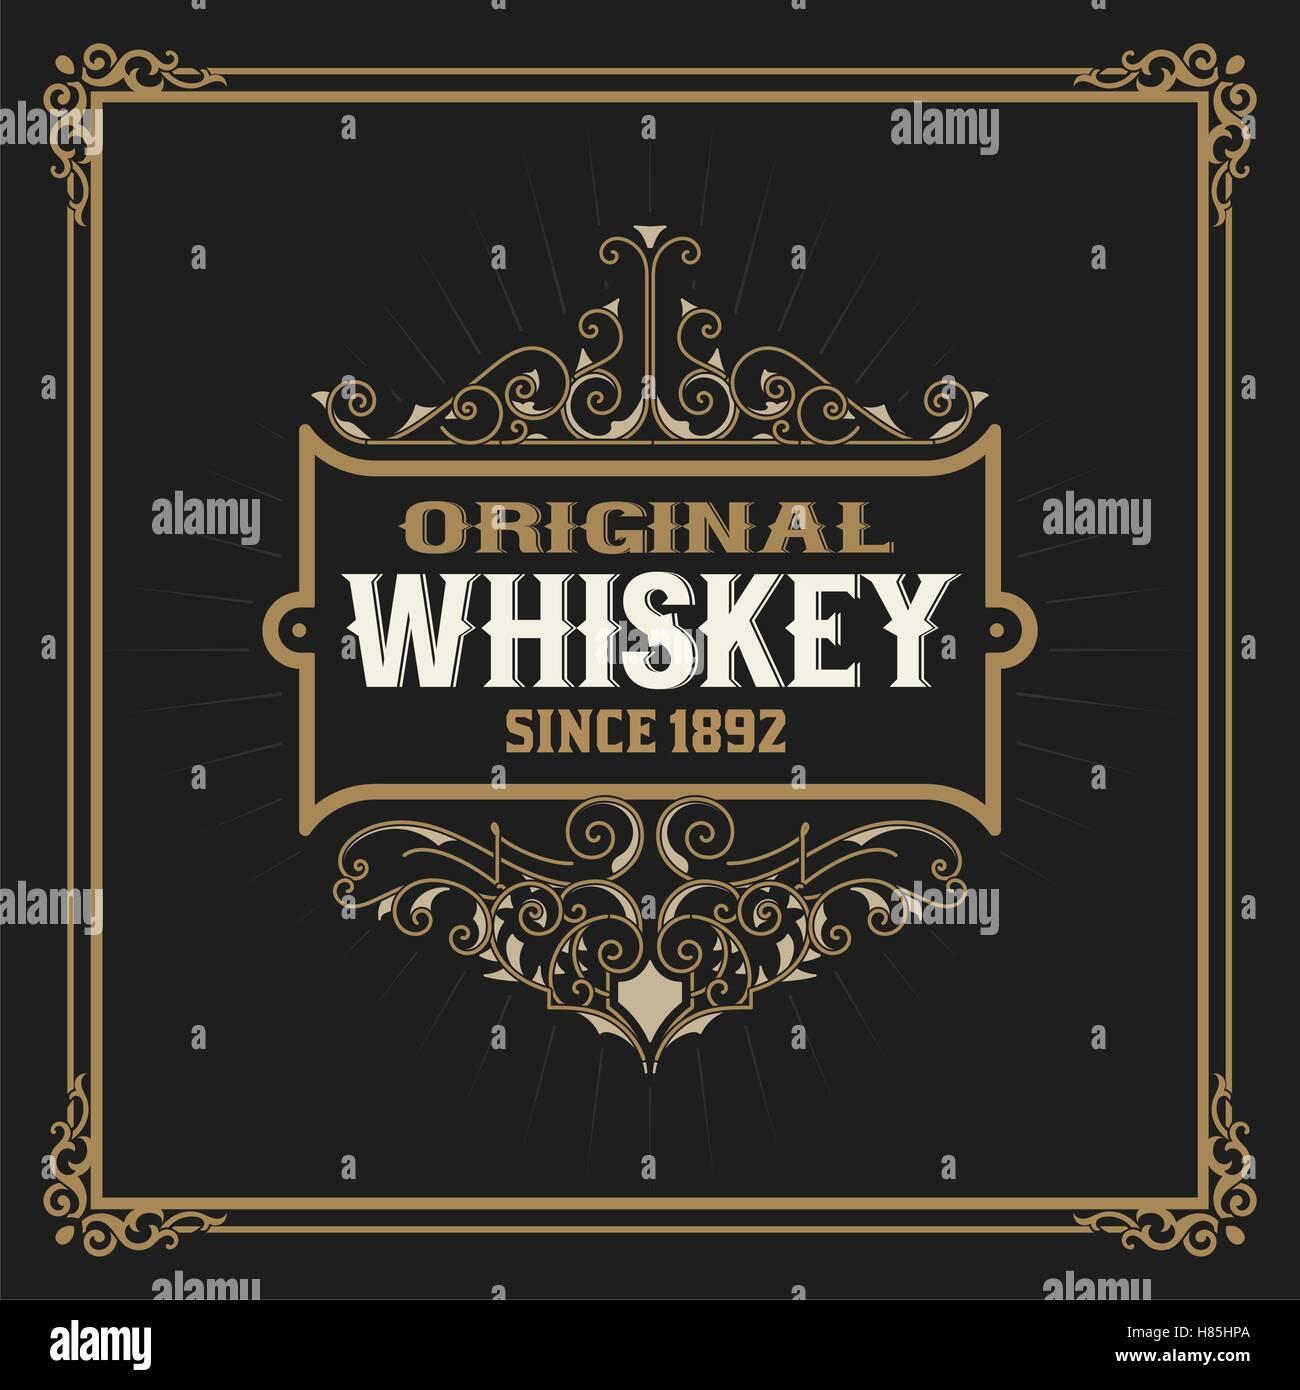 vintage whiskey label stock photos vintage whiskey label stock